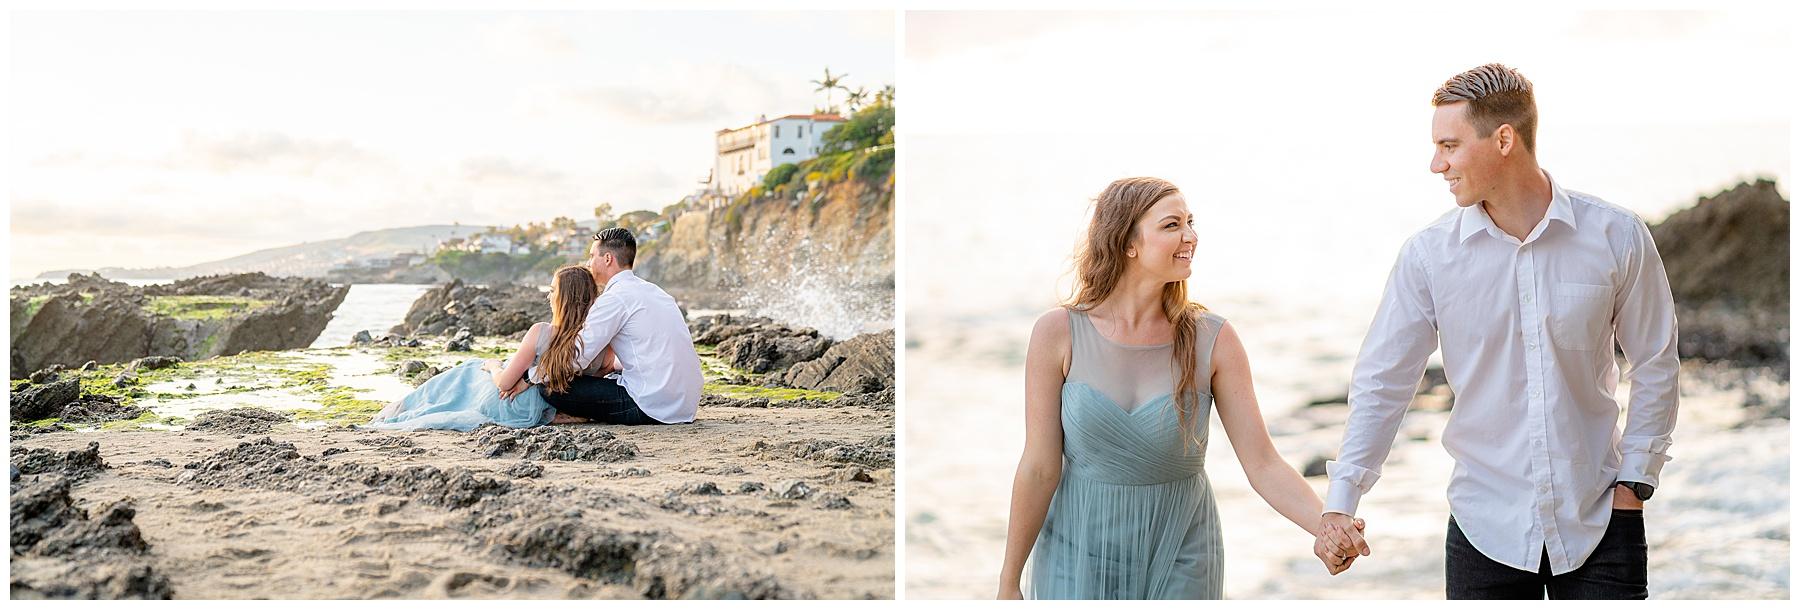 victoria beach laguna engagement photos